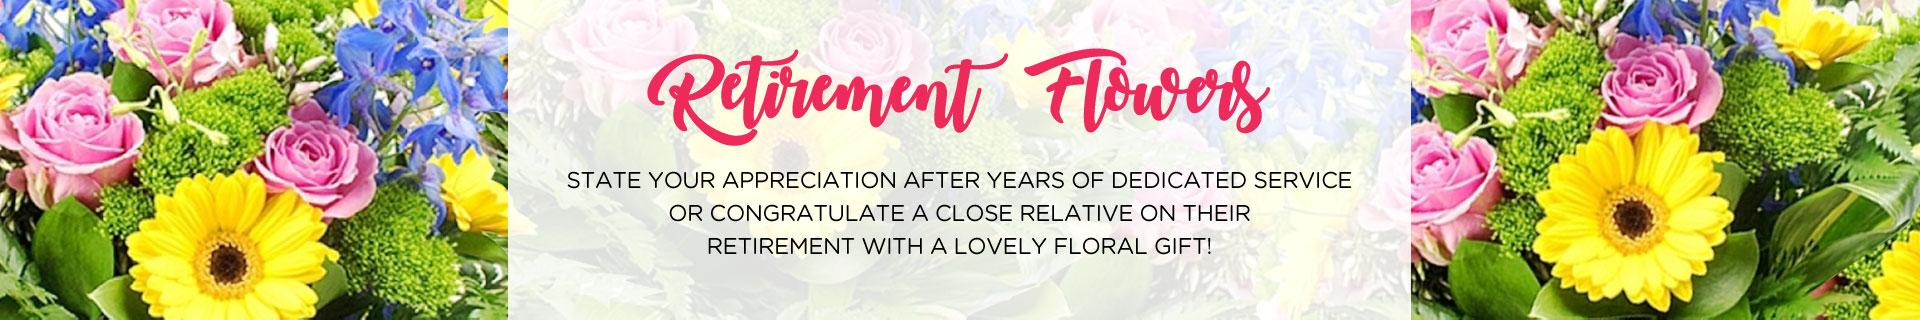 Retirement Flowers